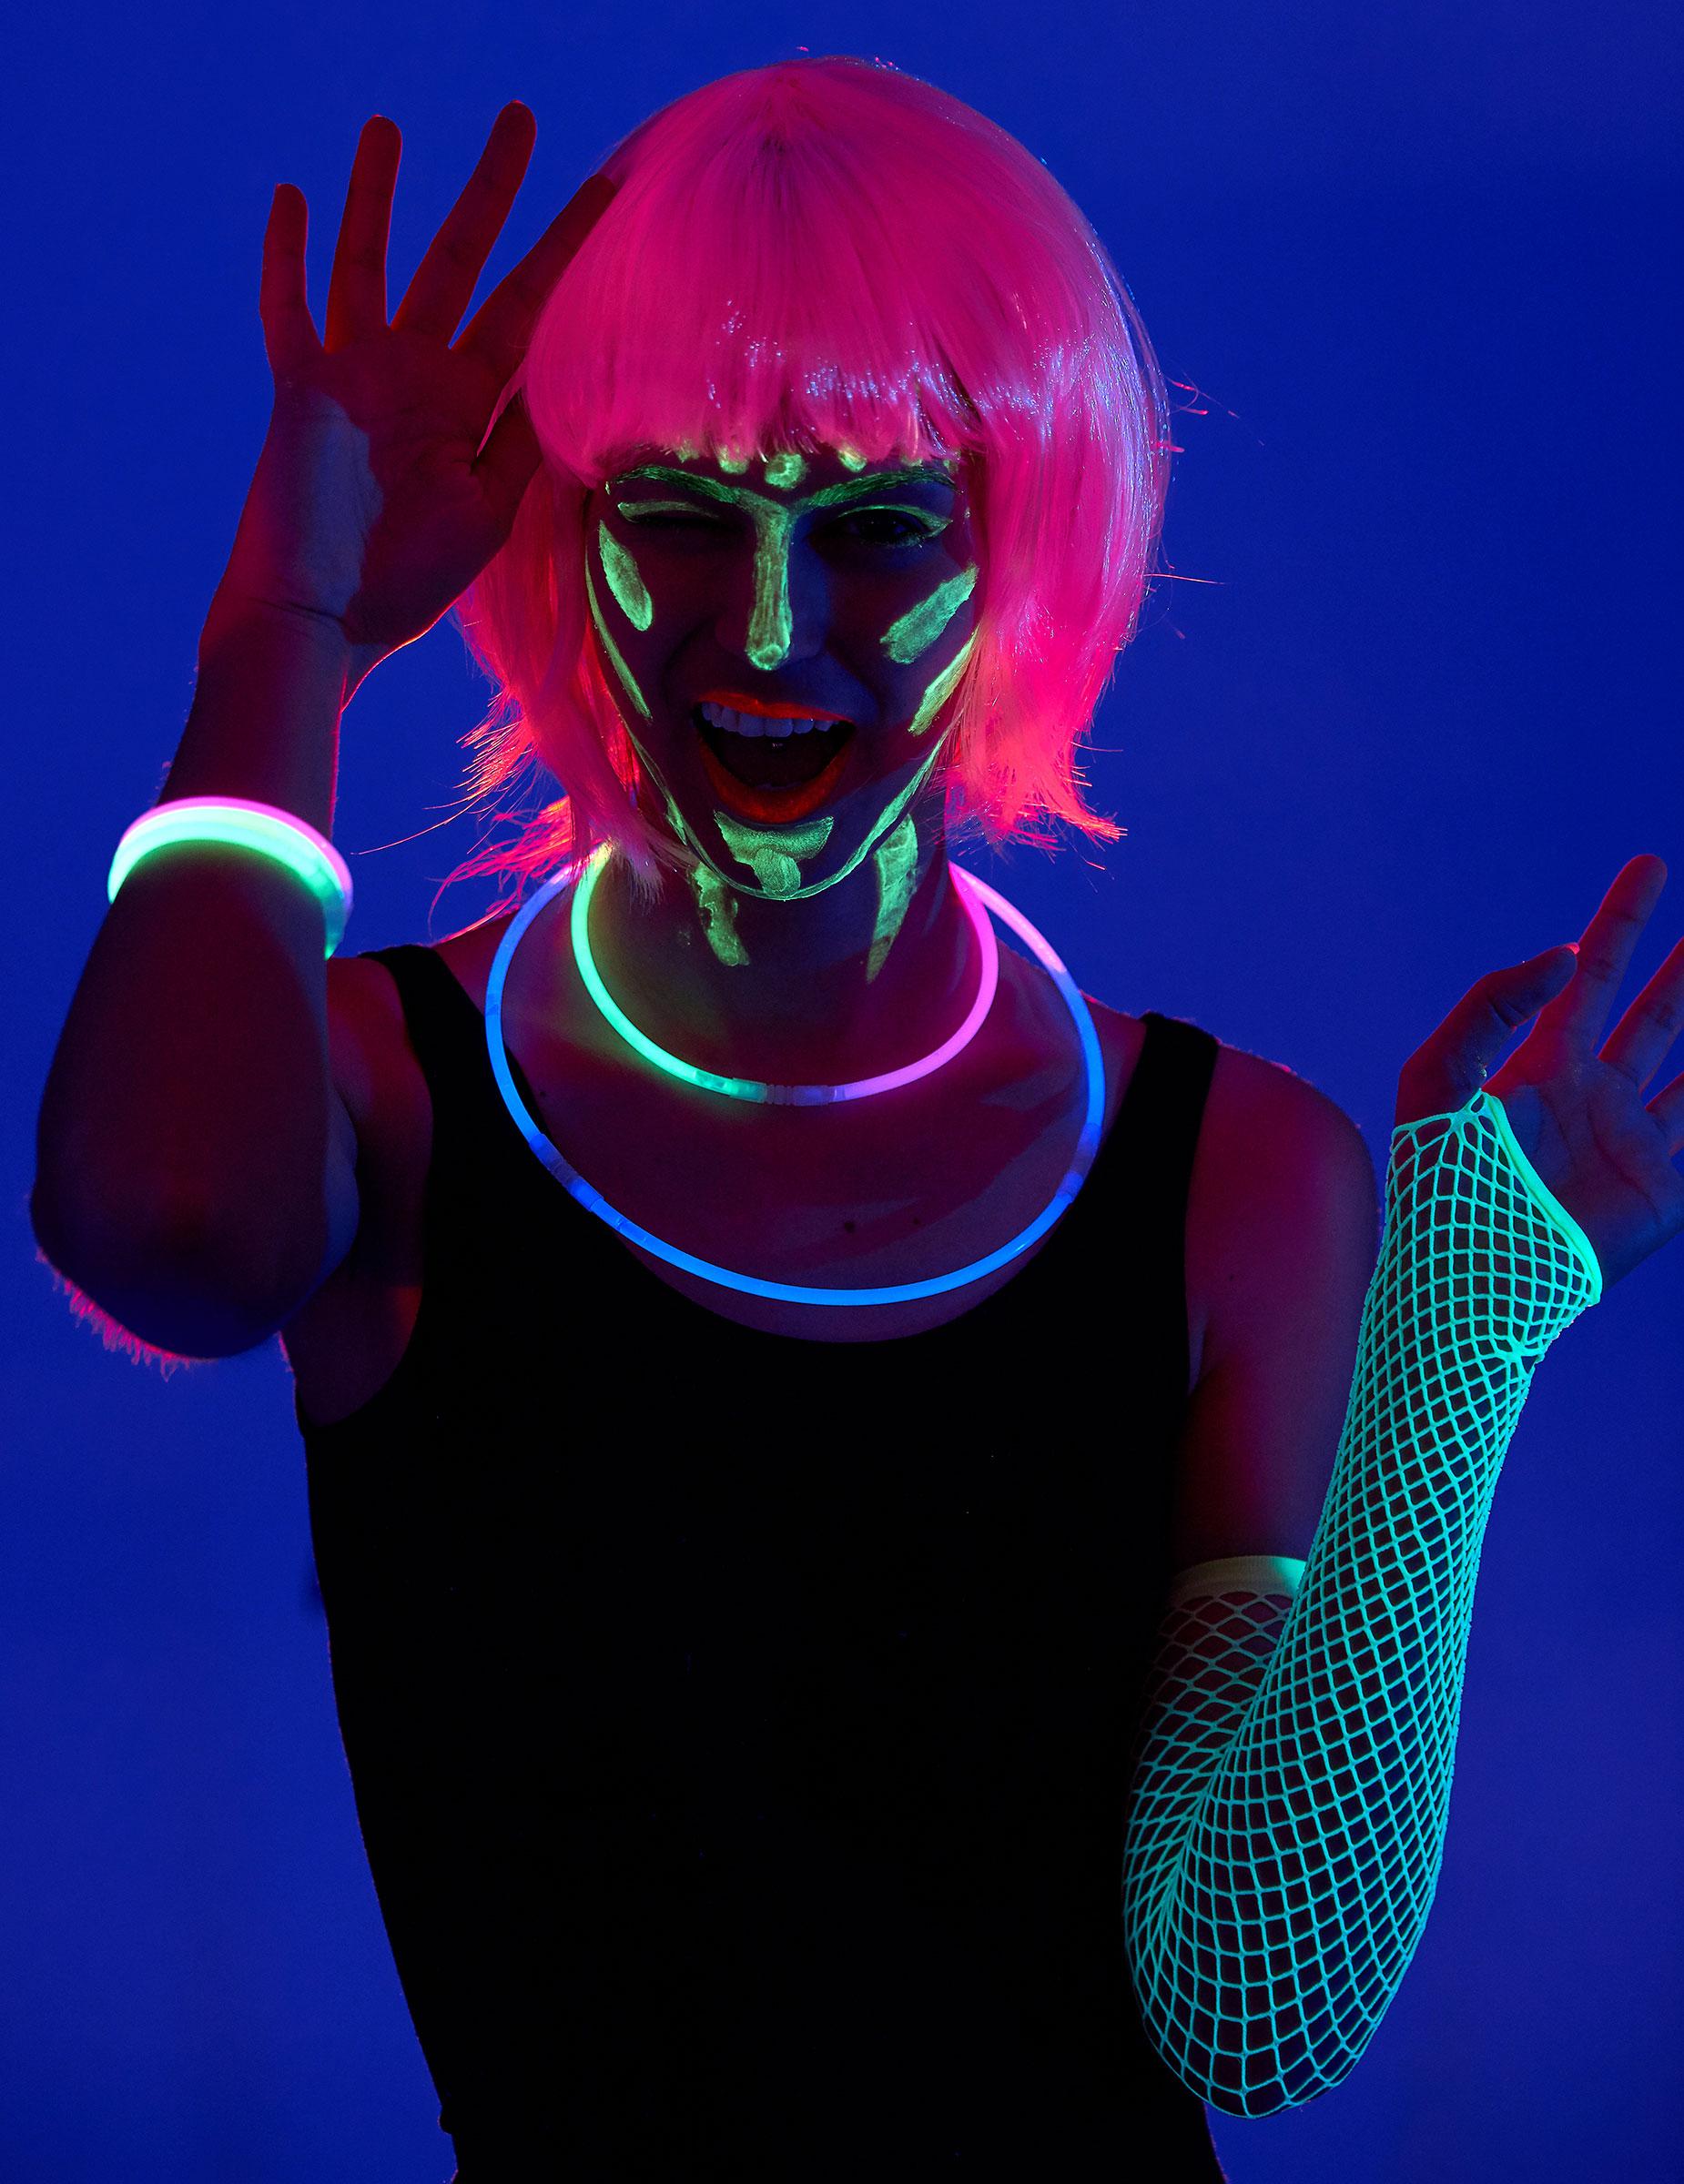 fluoreszierende schminke halloween schminke und g nstige faschingskost me vegaoo. Black Bedroom Furniture Sets. Home Design Ideas